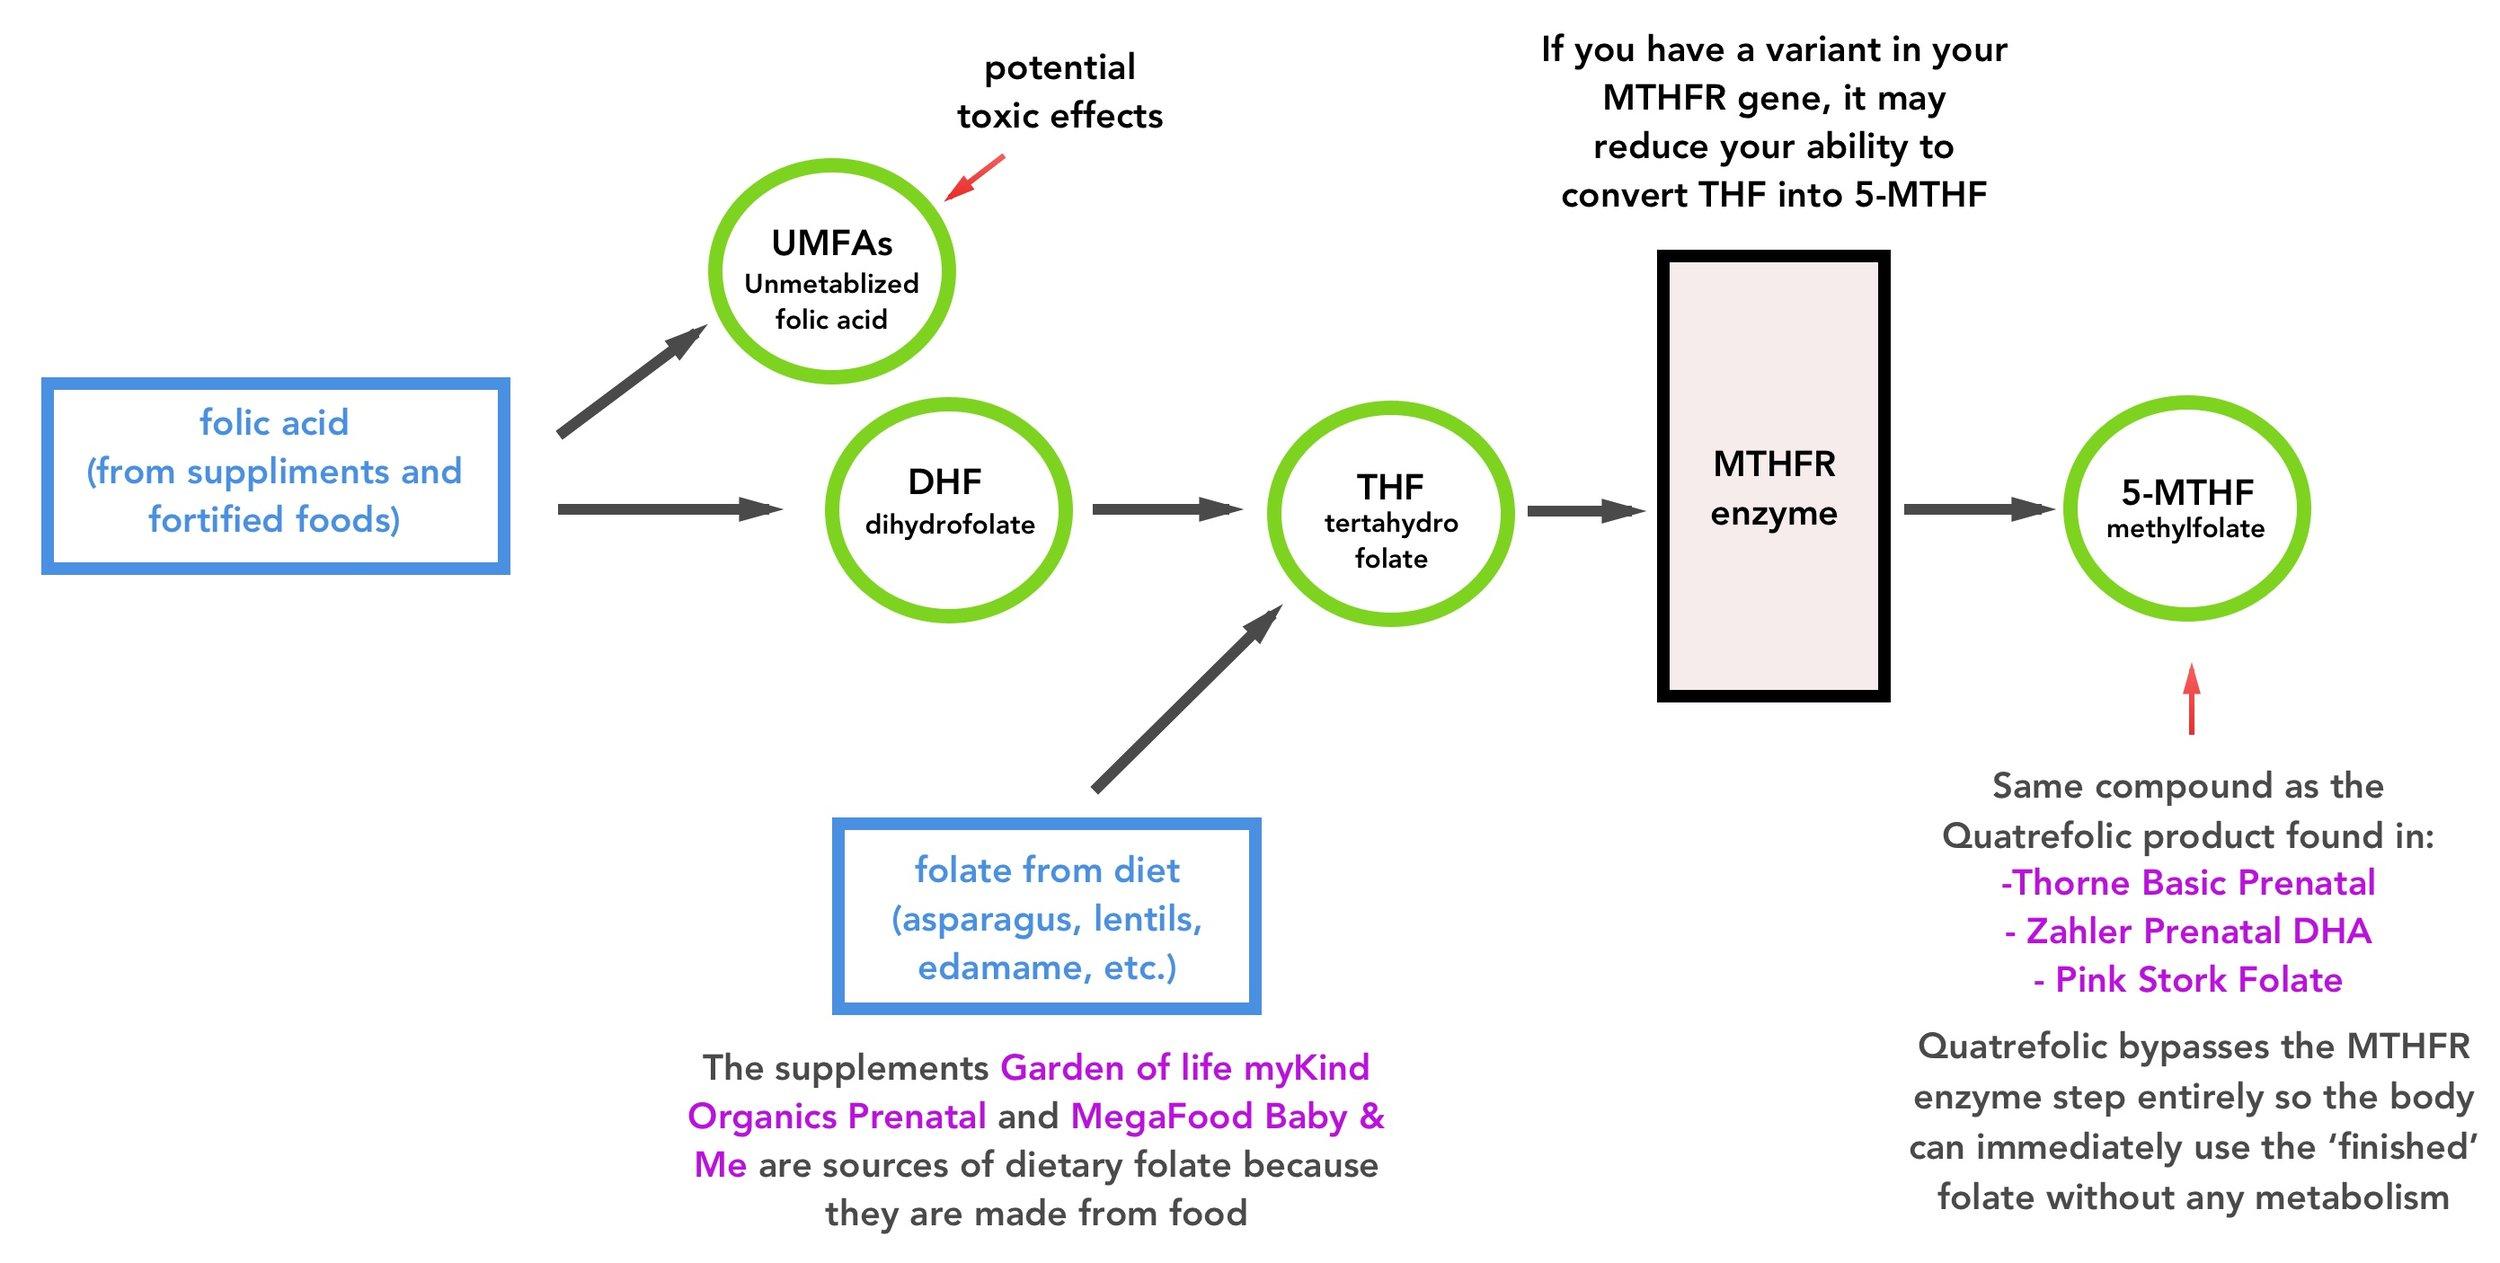 Folic acid metabolism to 5-MTHF methylfolate and MTHFR genetic variants